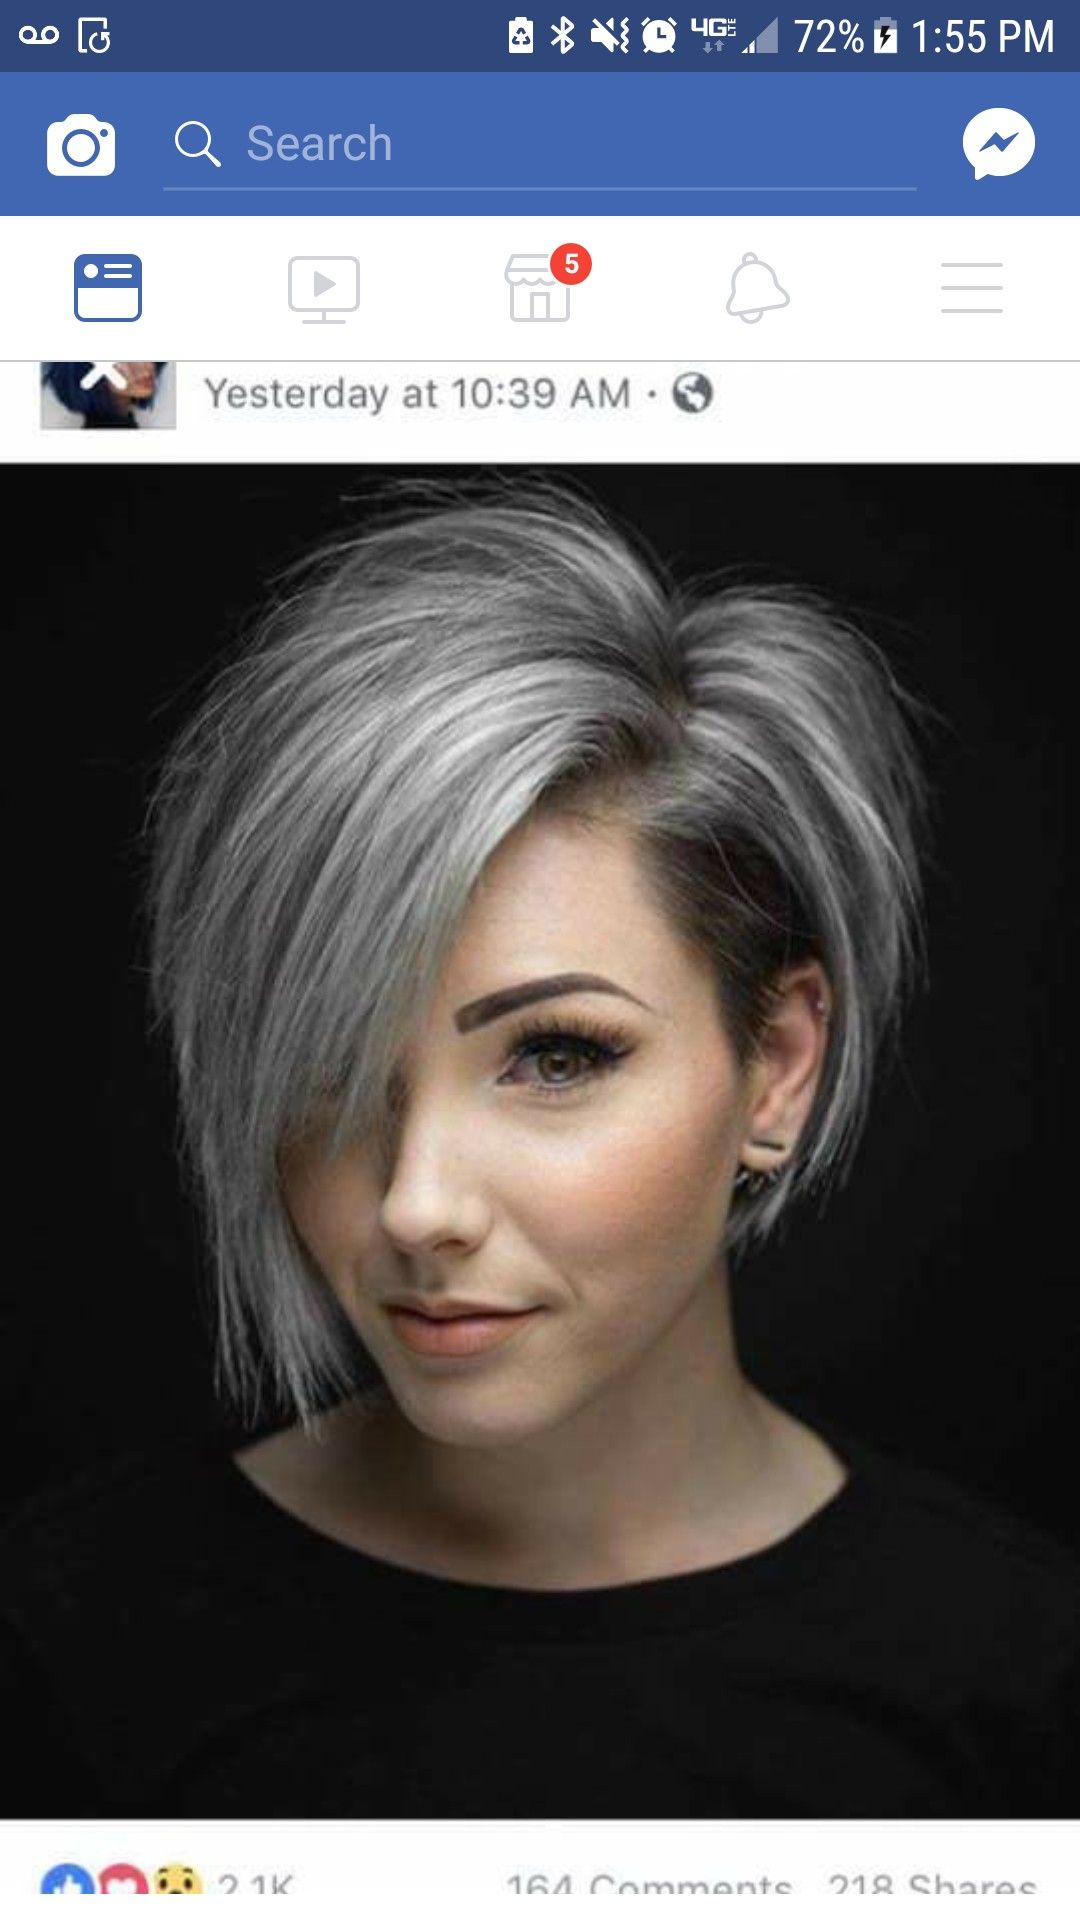 Pin by Marili Korff on Haar idees  Pinterest  Hair style Hair